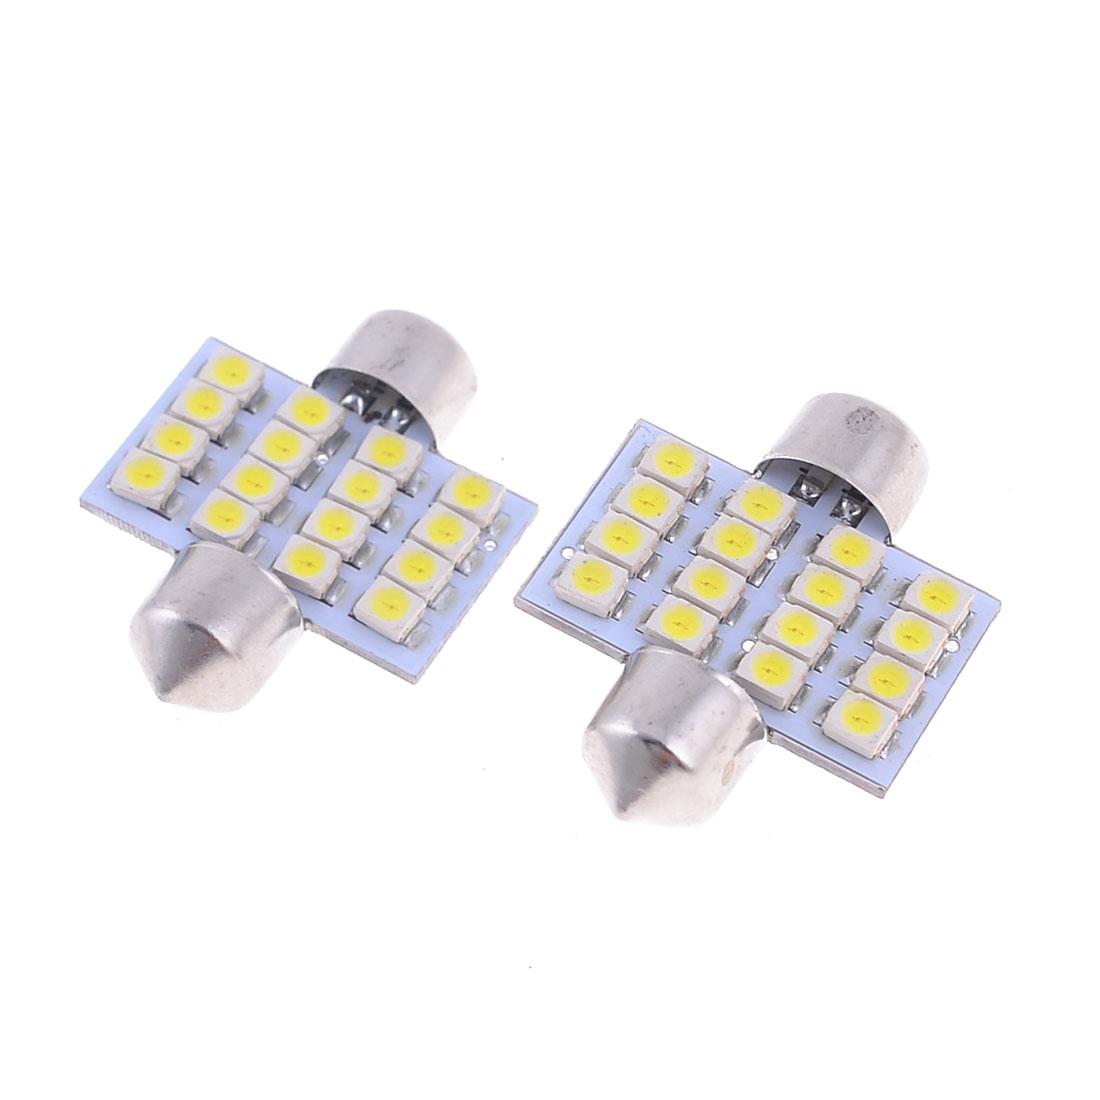 "2 Pcs 31mm 1.25"" 16-SMD 1210 White LED Festoon Dome Light Bulbs 3022 3175 DE3175"